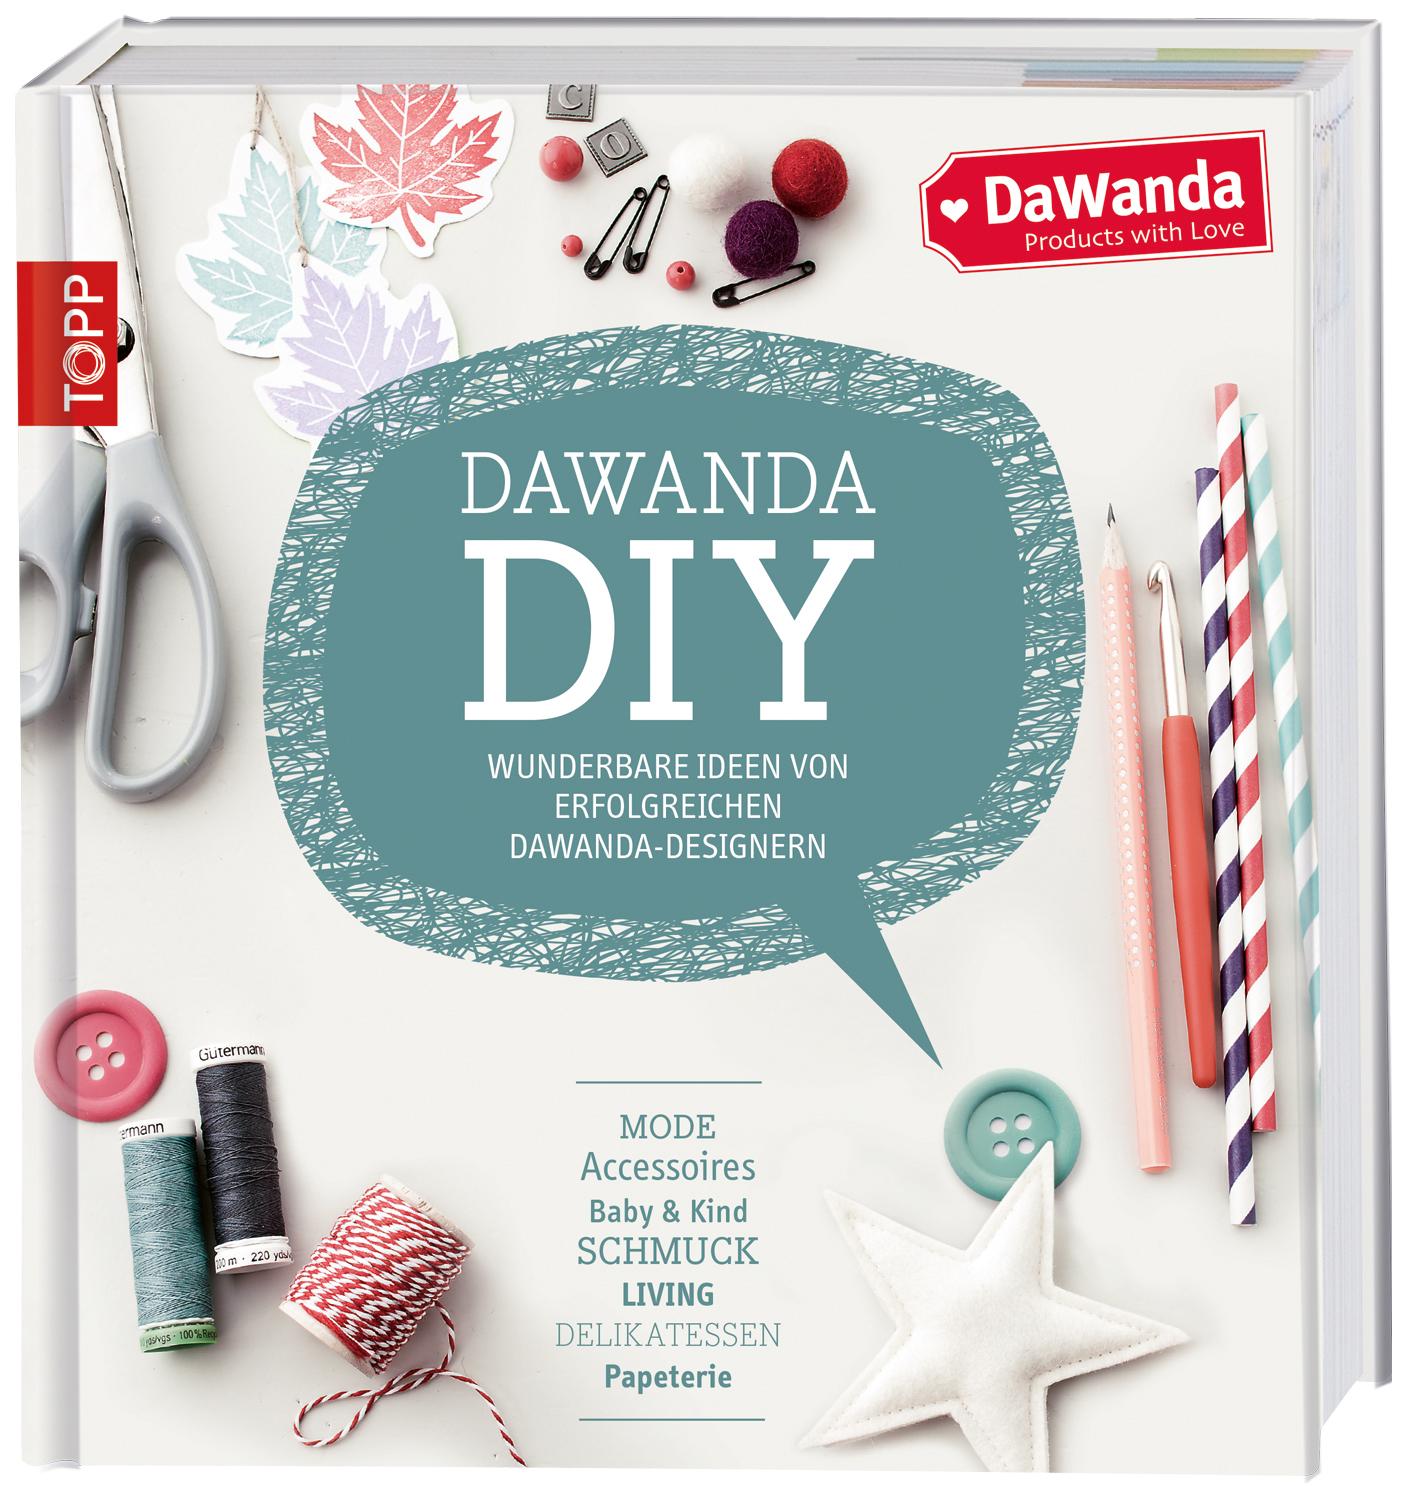 Rezension: DaWanda DIY: Wunderbare Ideen von erfolgreichen DaWanda-Designern